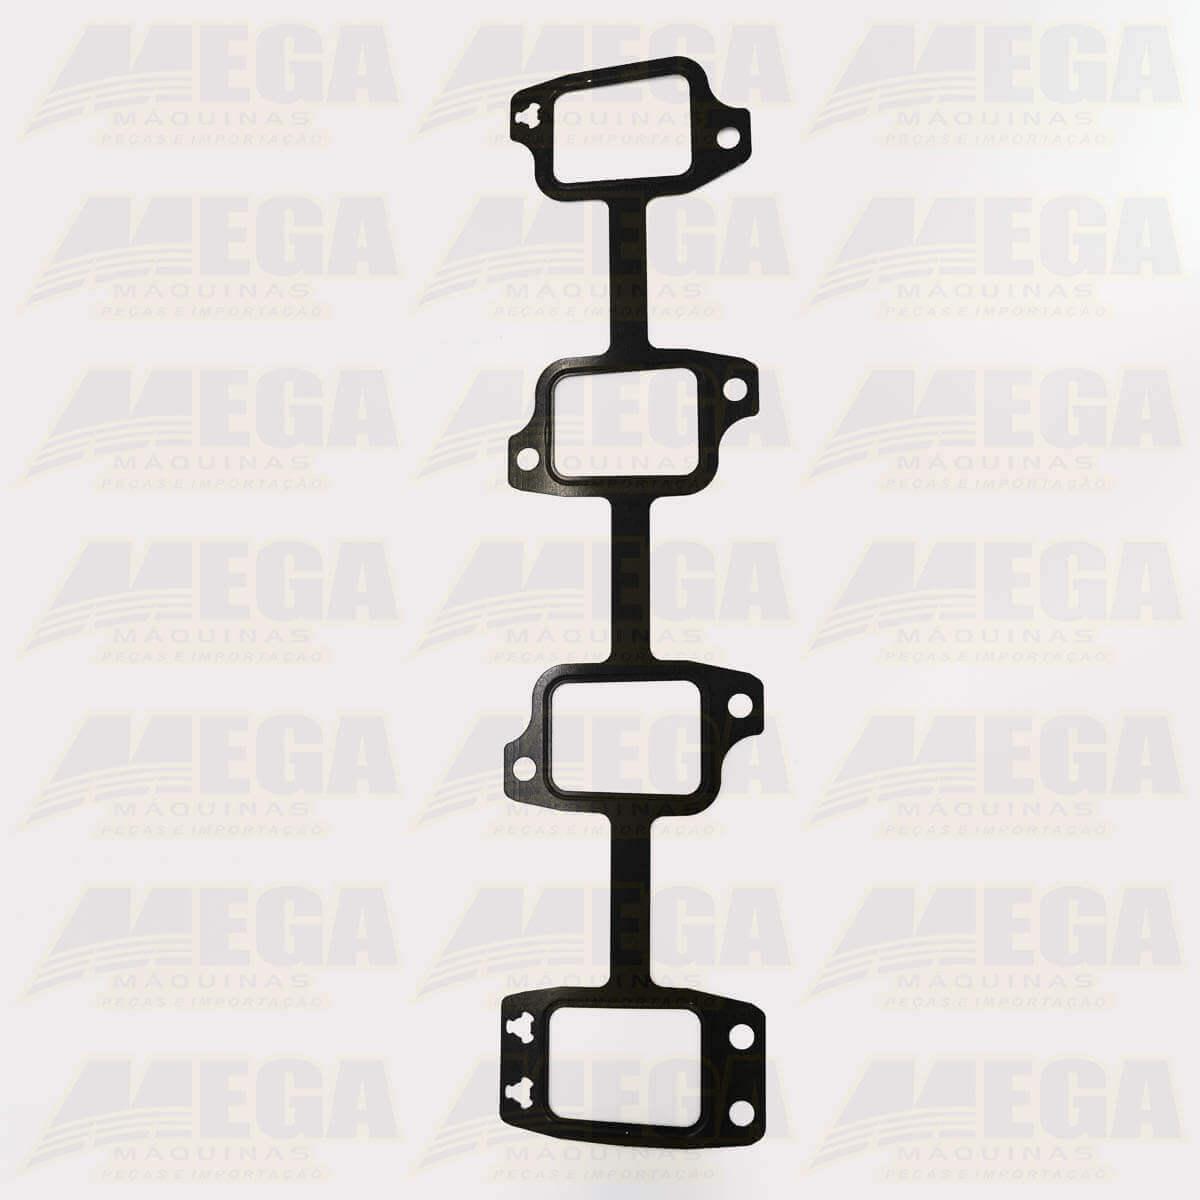 Junta do Coletor de Admissão do Motor DieselMax 444 - 320/05550